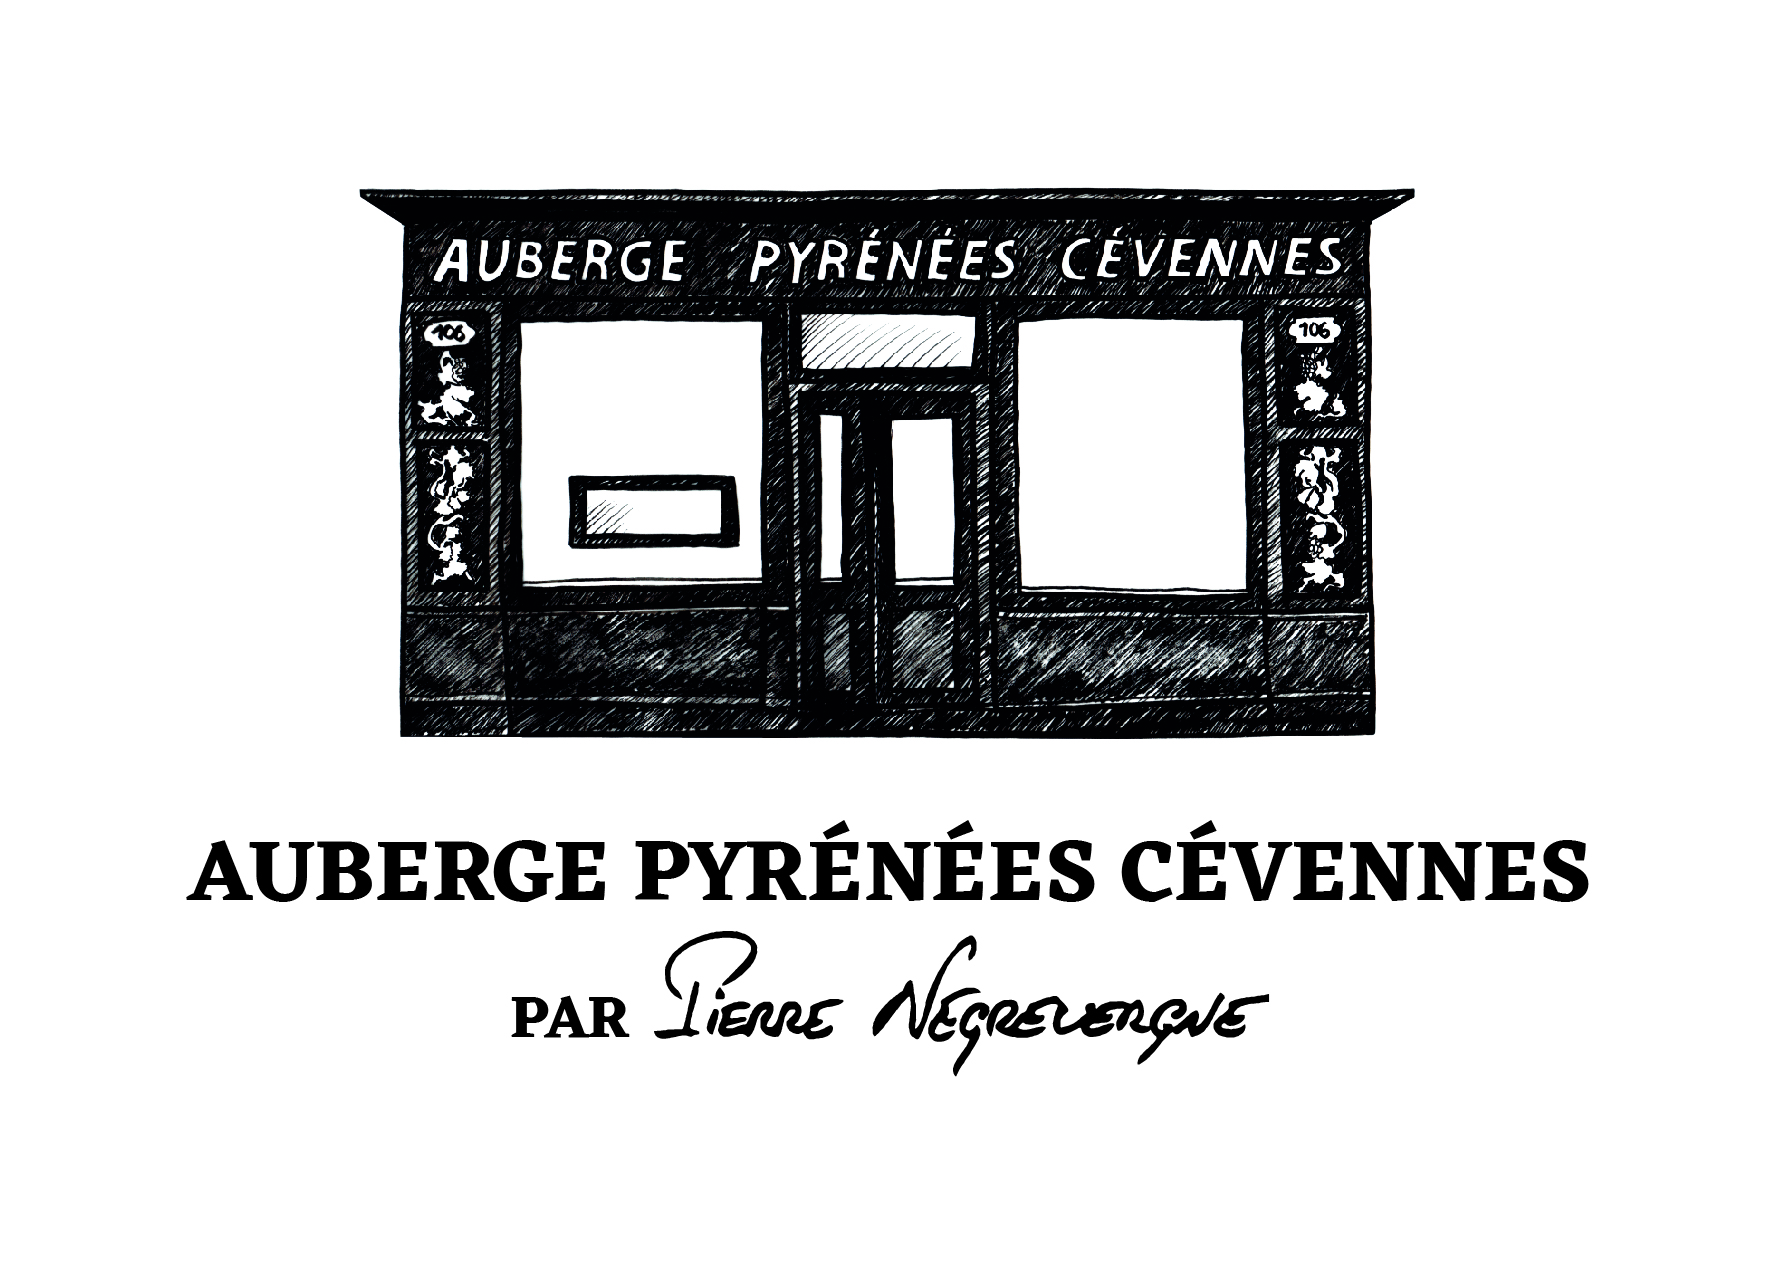 Adhérent AUBERGE PYRENEES CEVENNES - photo #17584